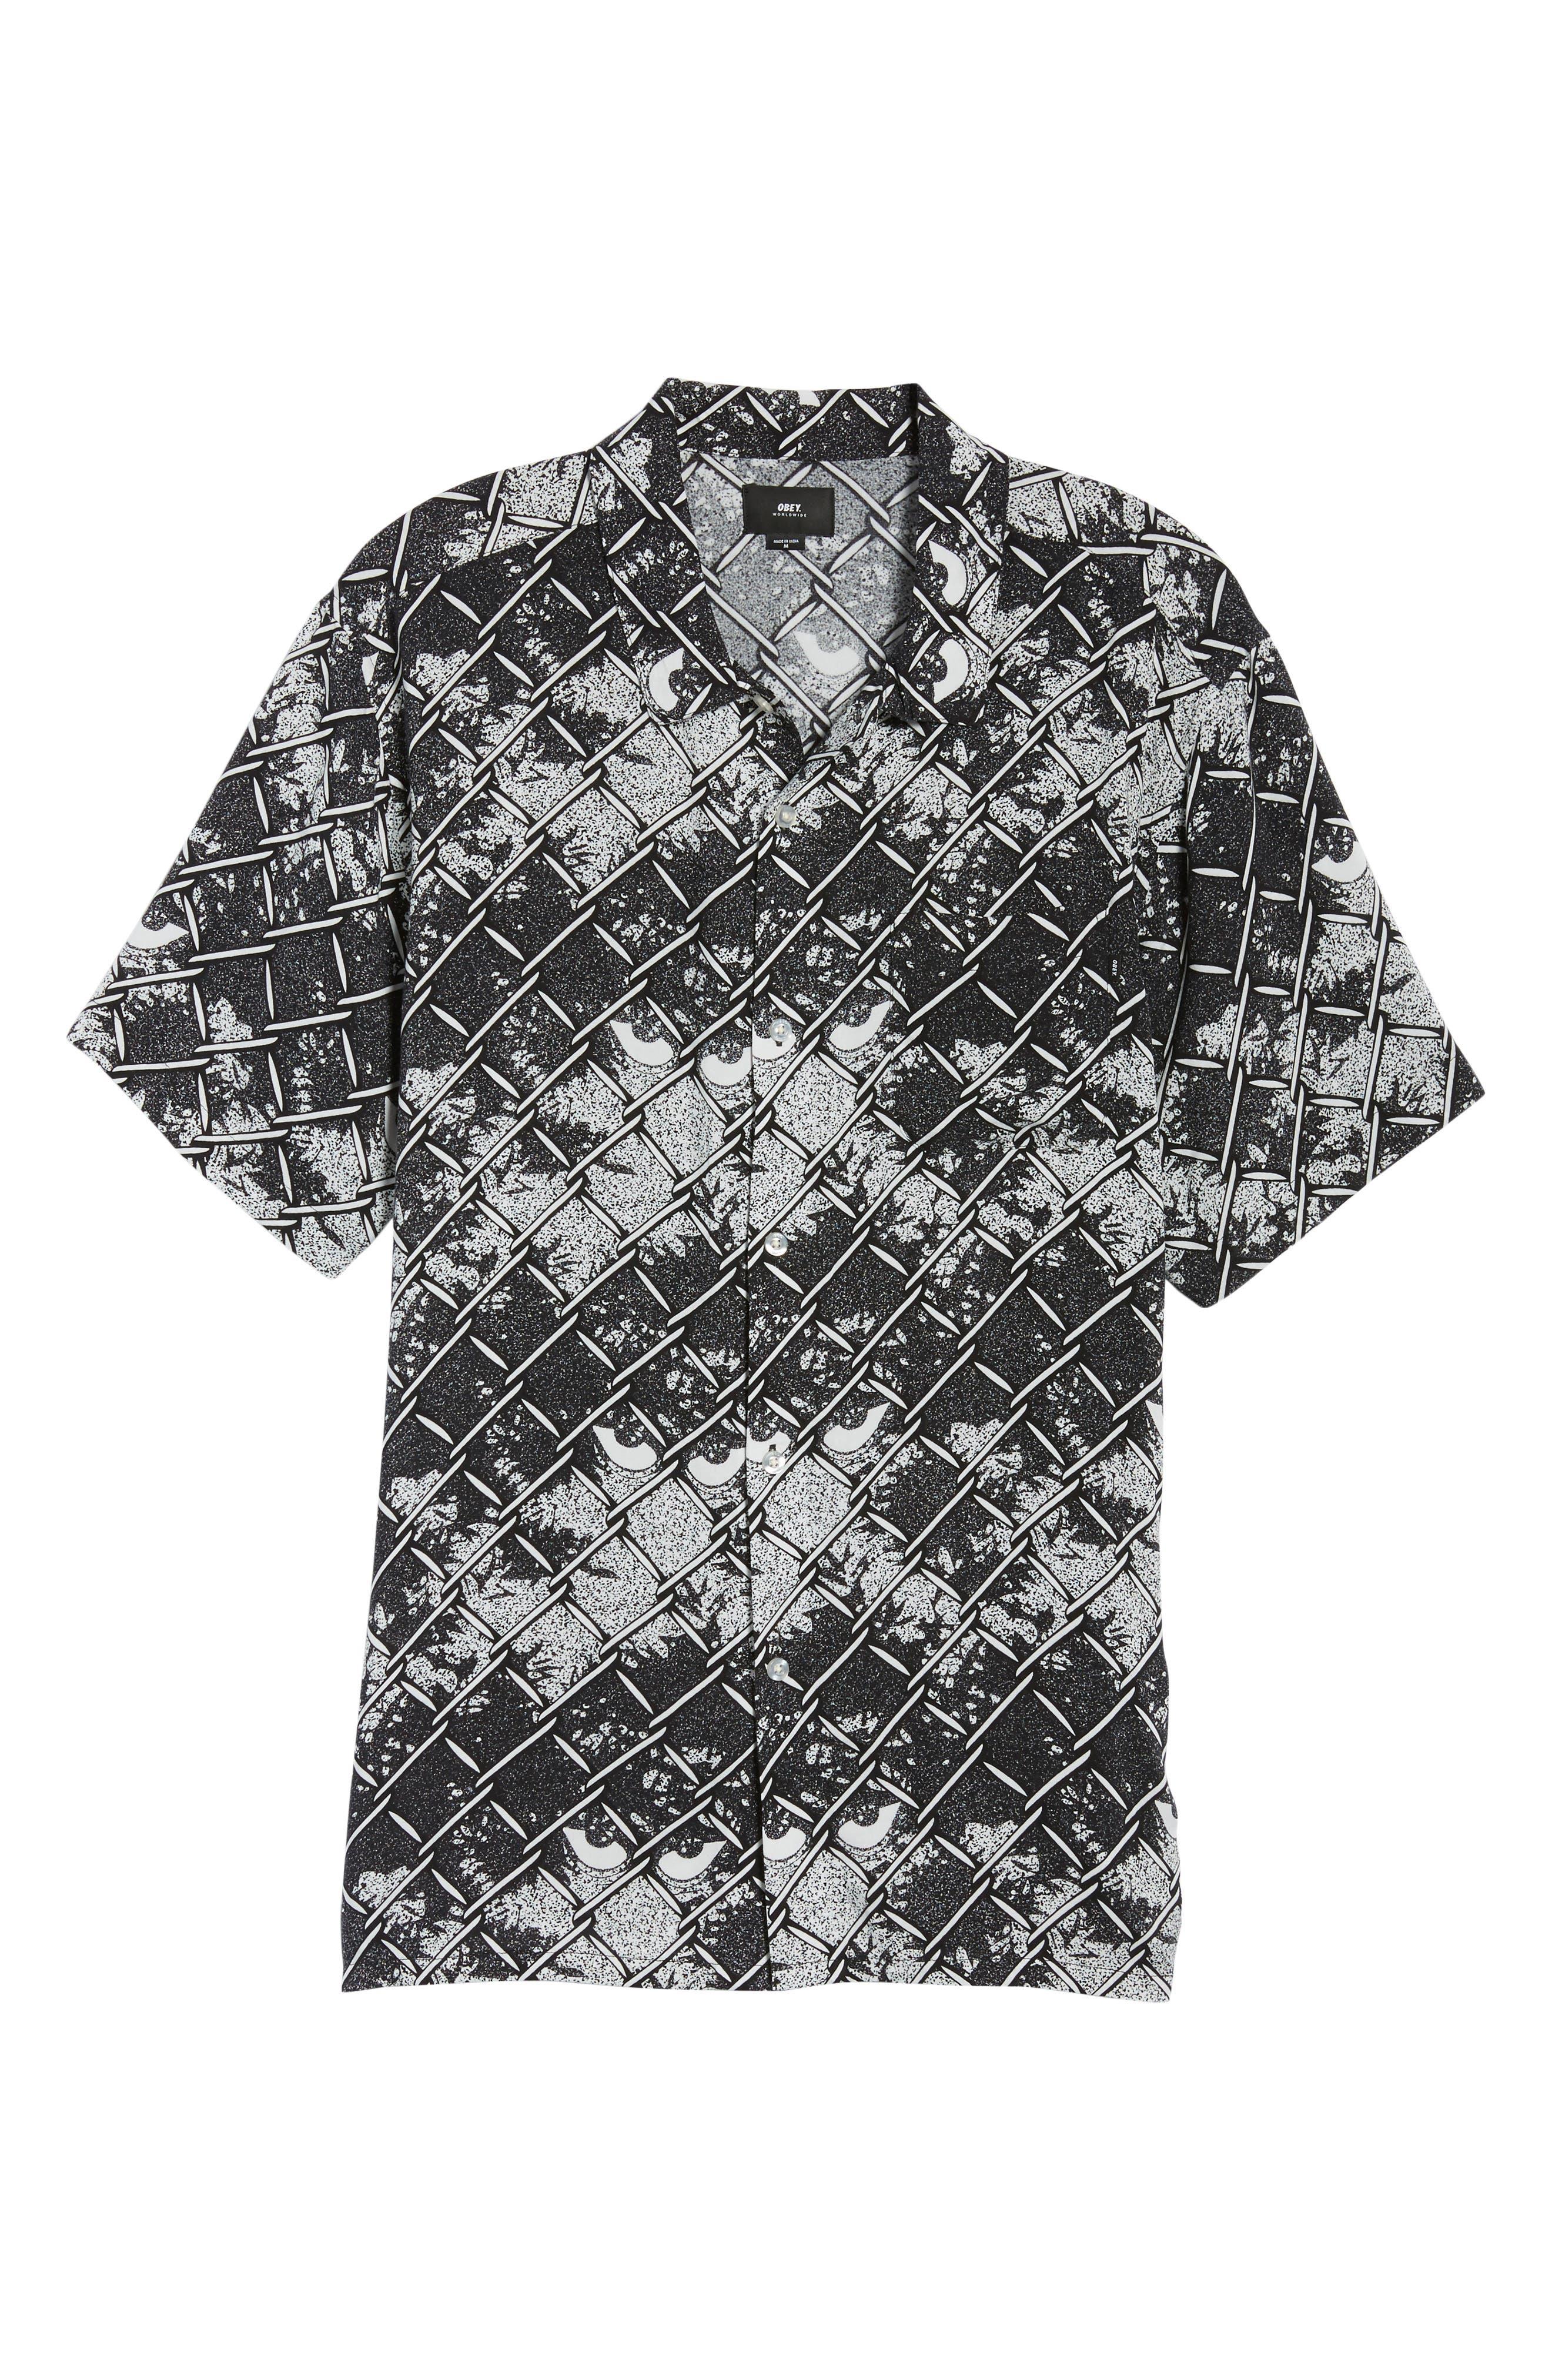 Gatekeeper Short Sleeve Shirt,                             Alternate thumbnail 6, color,                             002